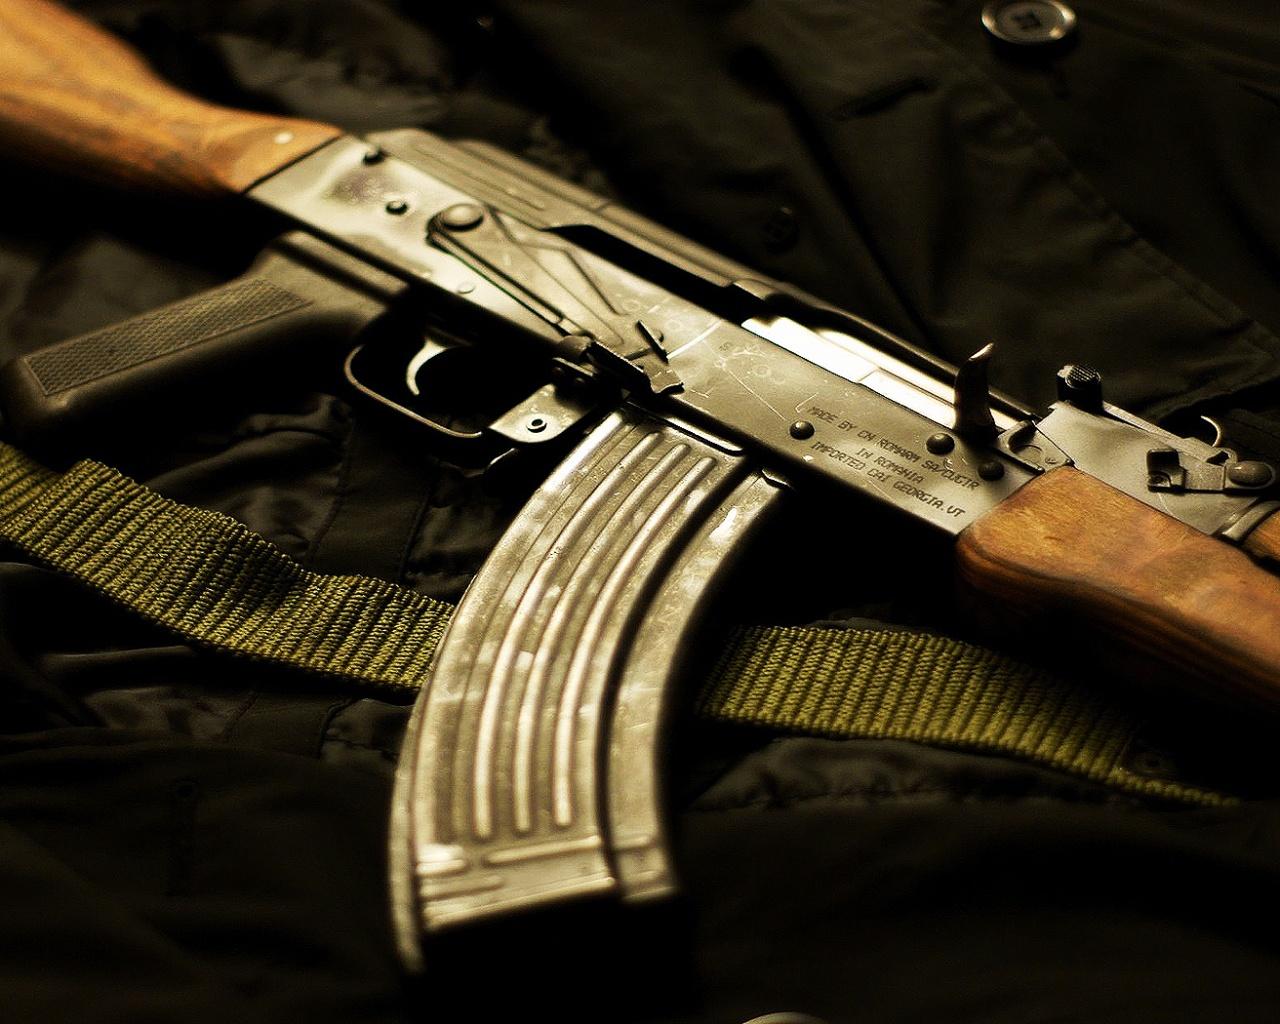 http://1.bp.blogspot.com/-iORAZN0Atag/Tag1v99zRVI/AAAAAAAAABA/3kG7TMC-vQo/s1600/Creative_Wallpaper_Kalashnikov_AK-47_017802_.jpg